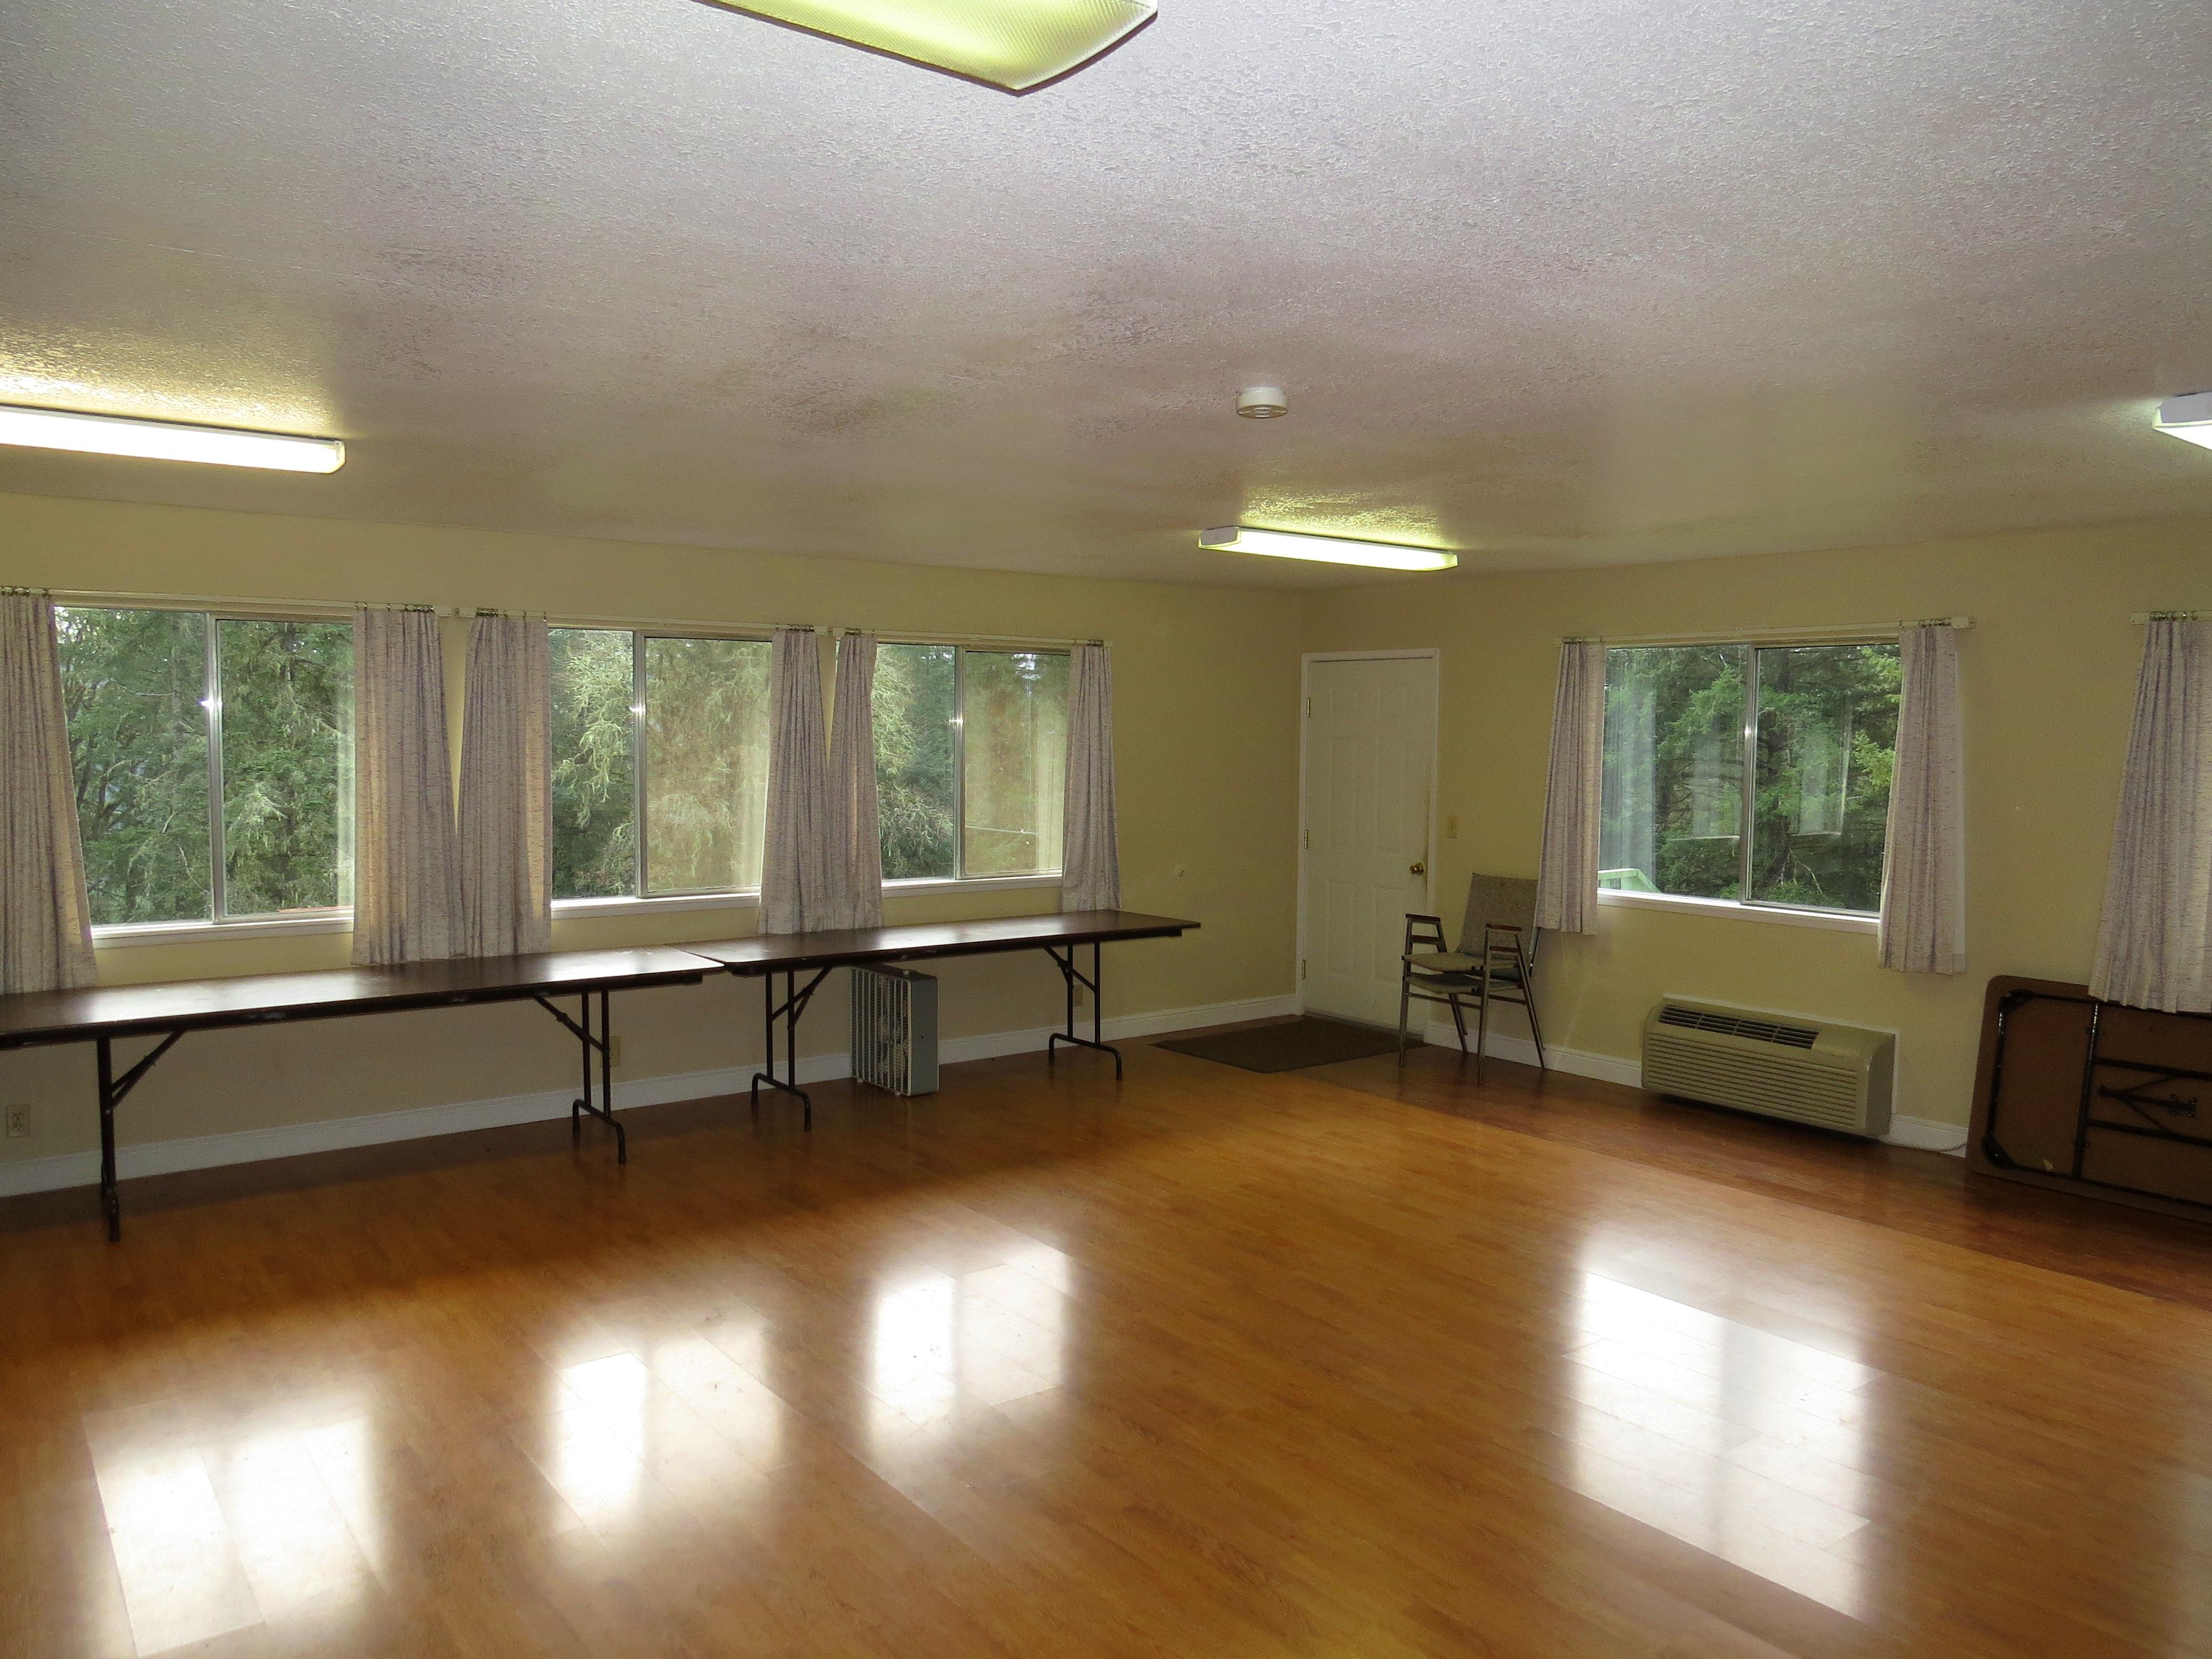 ashland-meeting-room-2